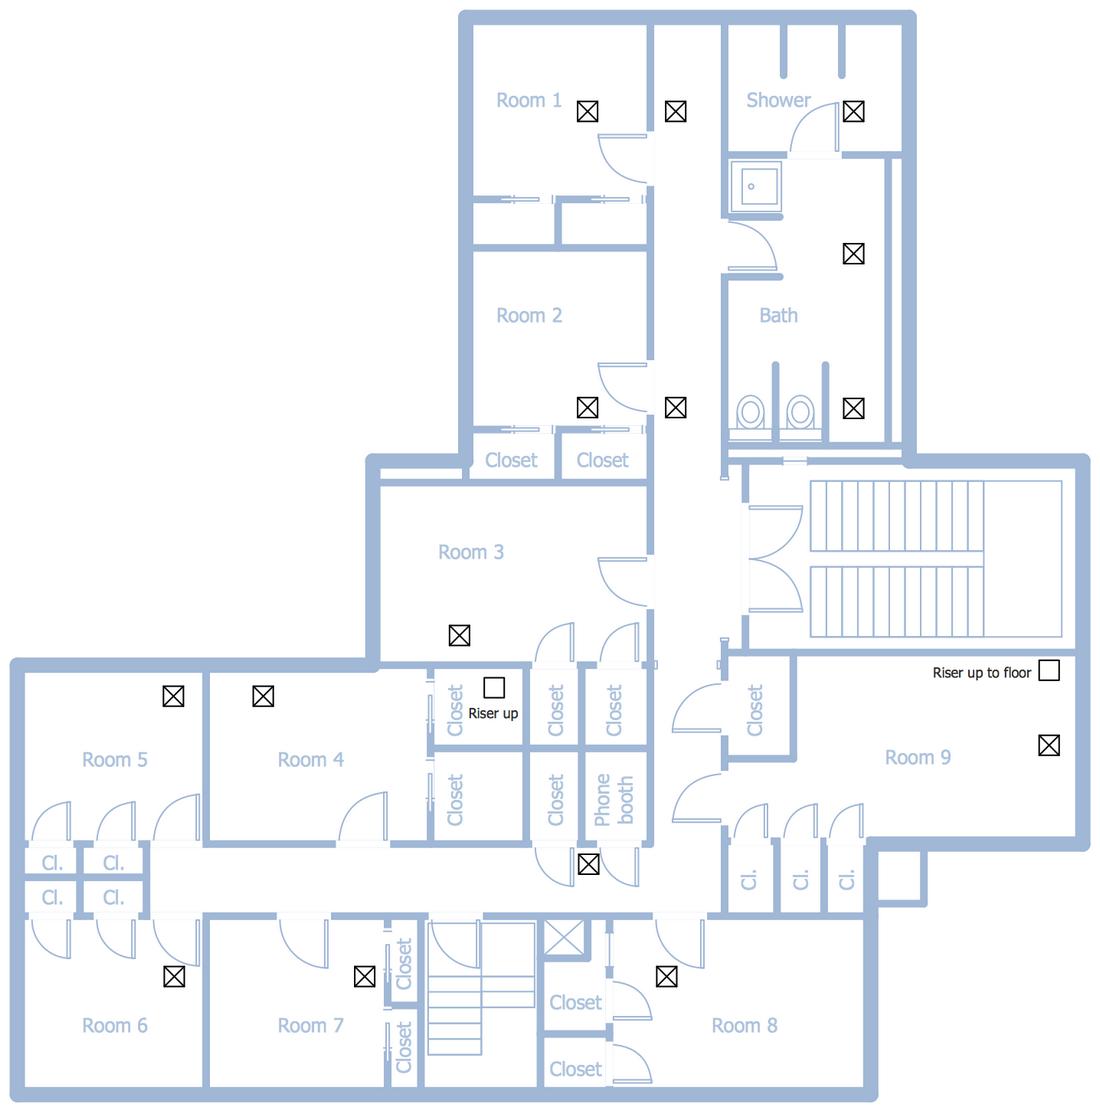 School HVAC Plan   Hvac design, Hvac ductwork, Hvac   Hvac Drawing Plans      Pinterest